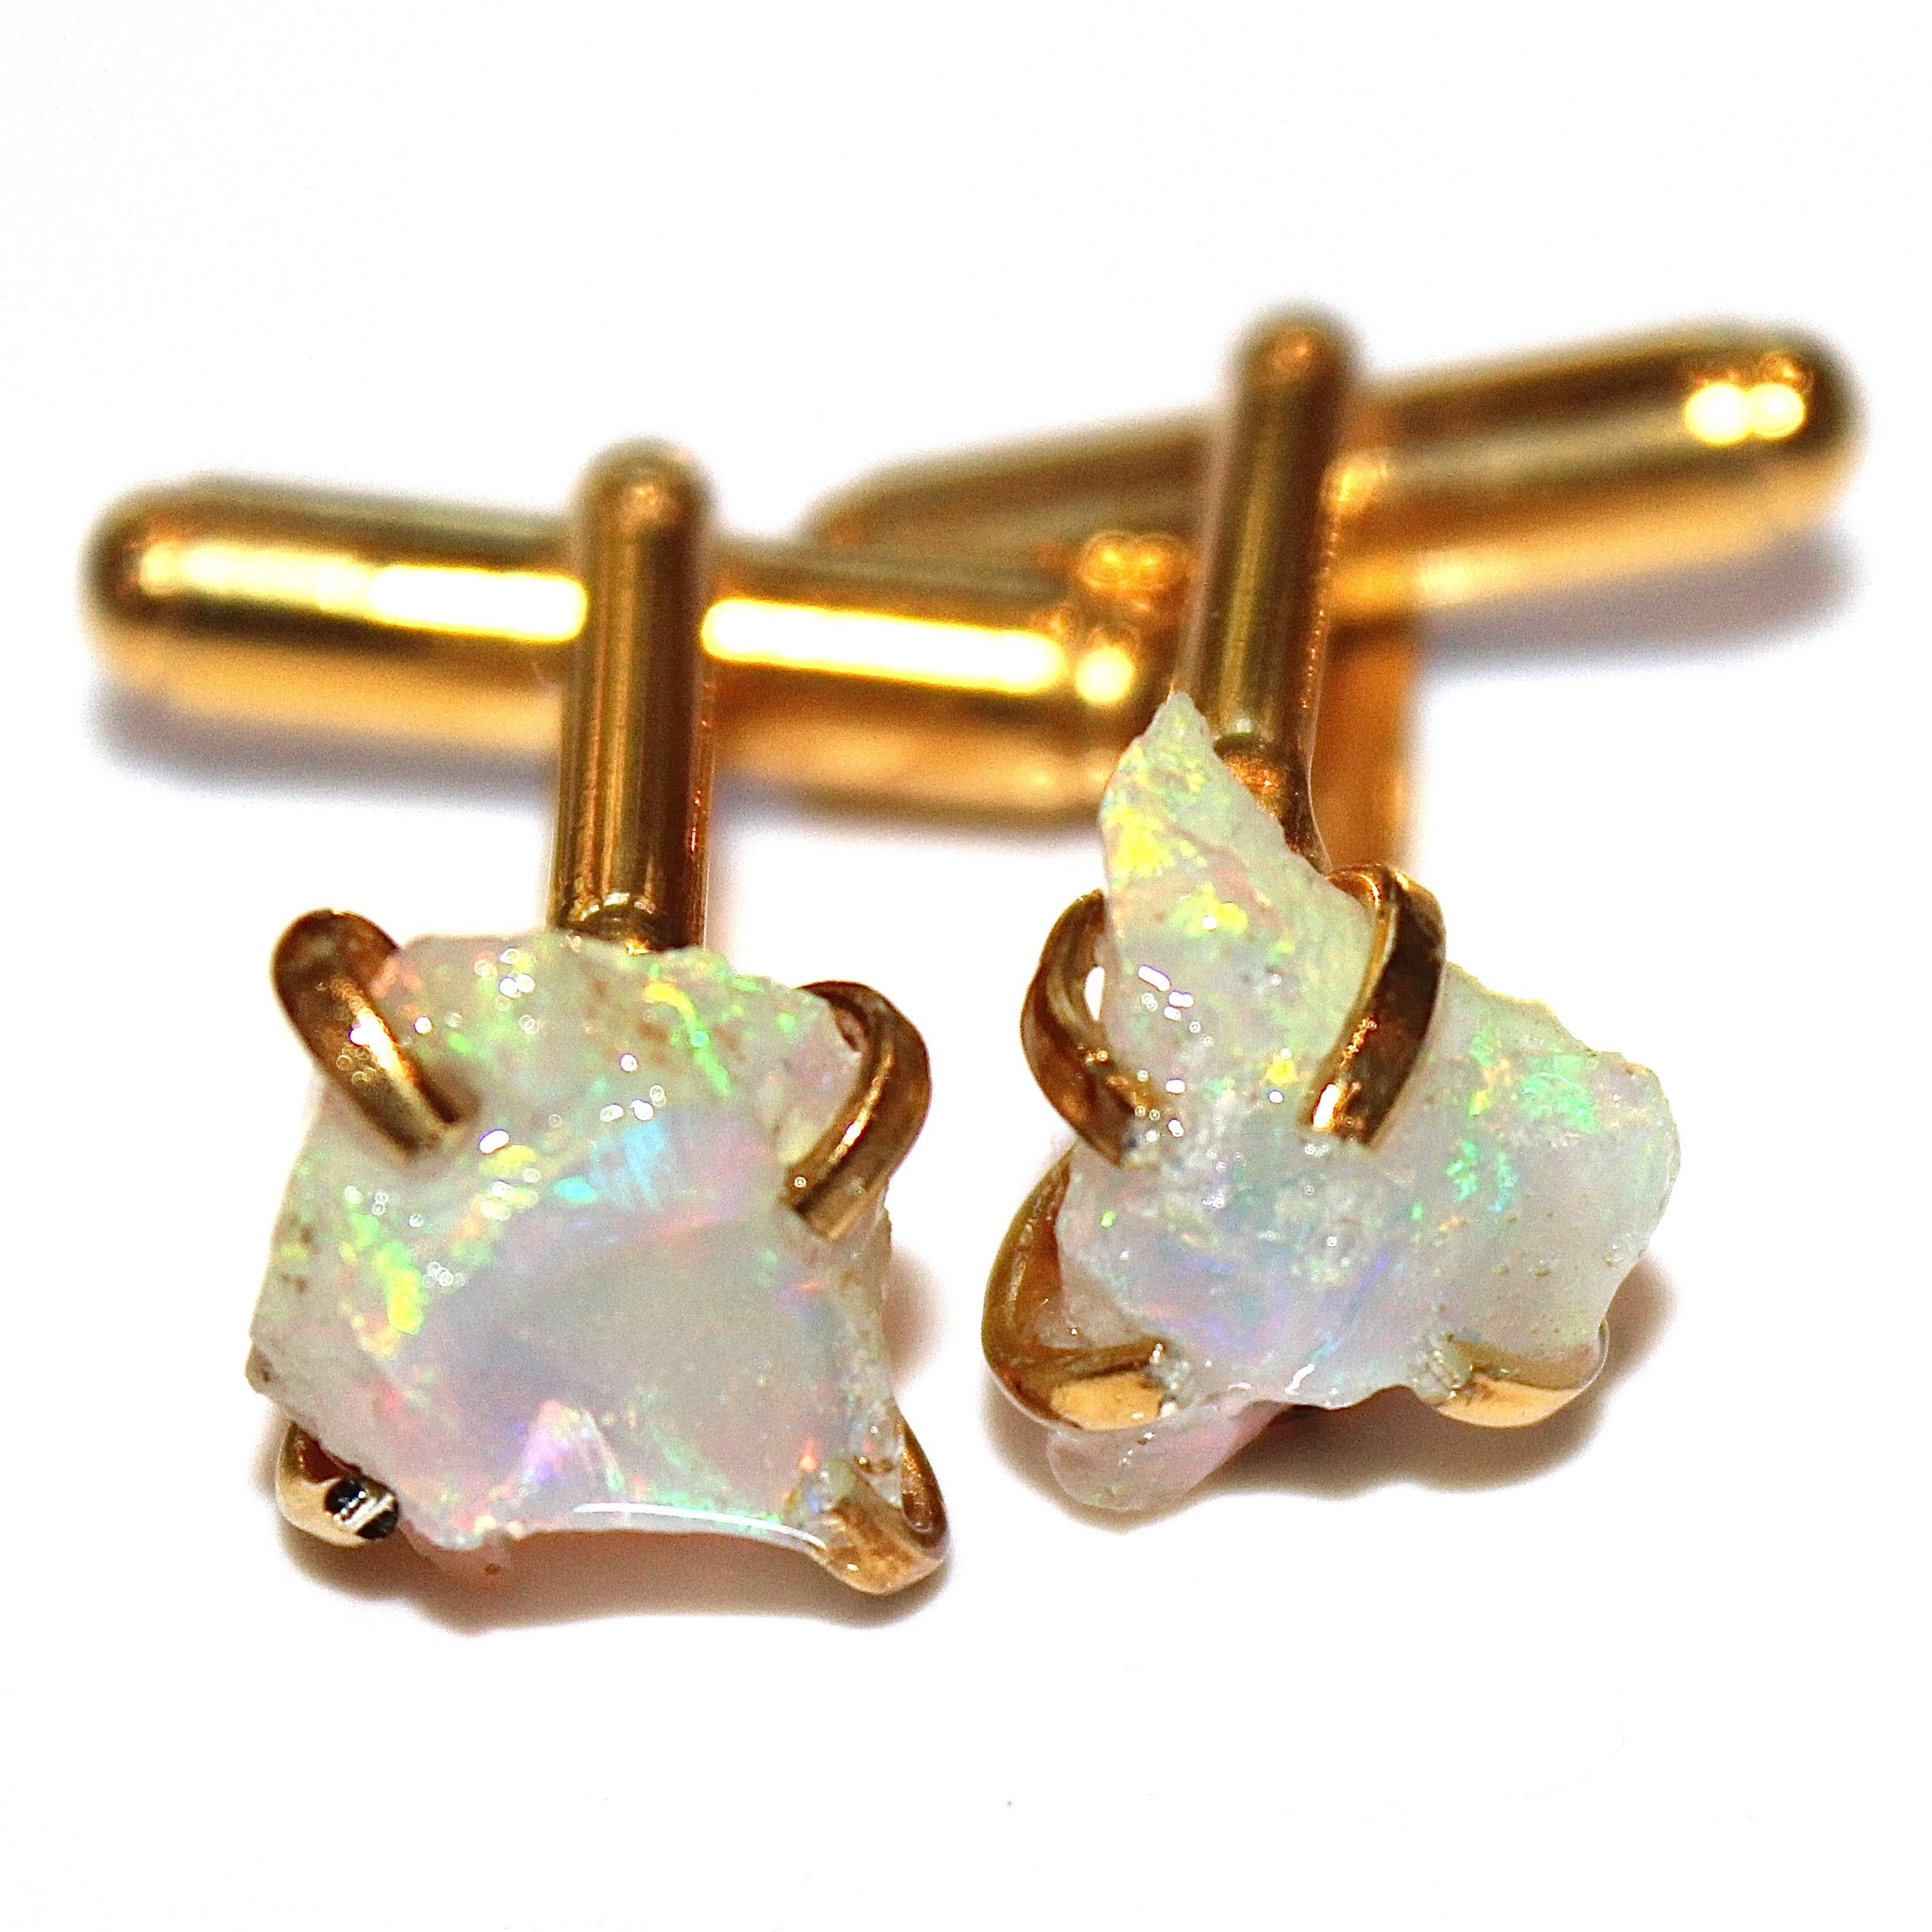 Raw Opal Cuff Link in Gold Vermeil by FizzCandy Jewelry